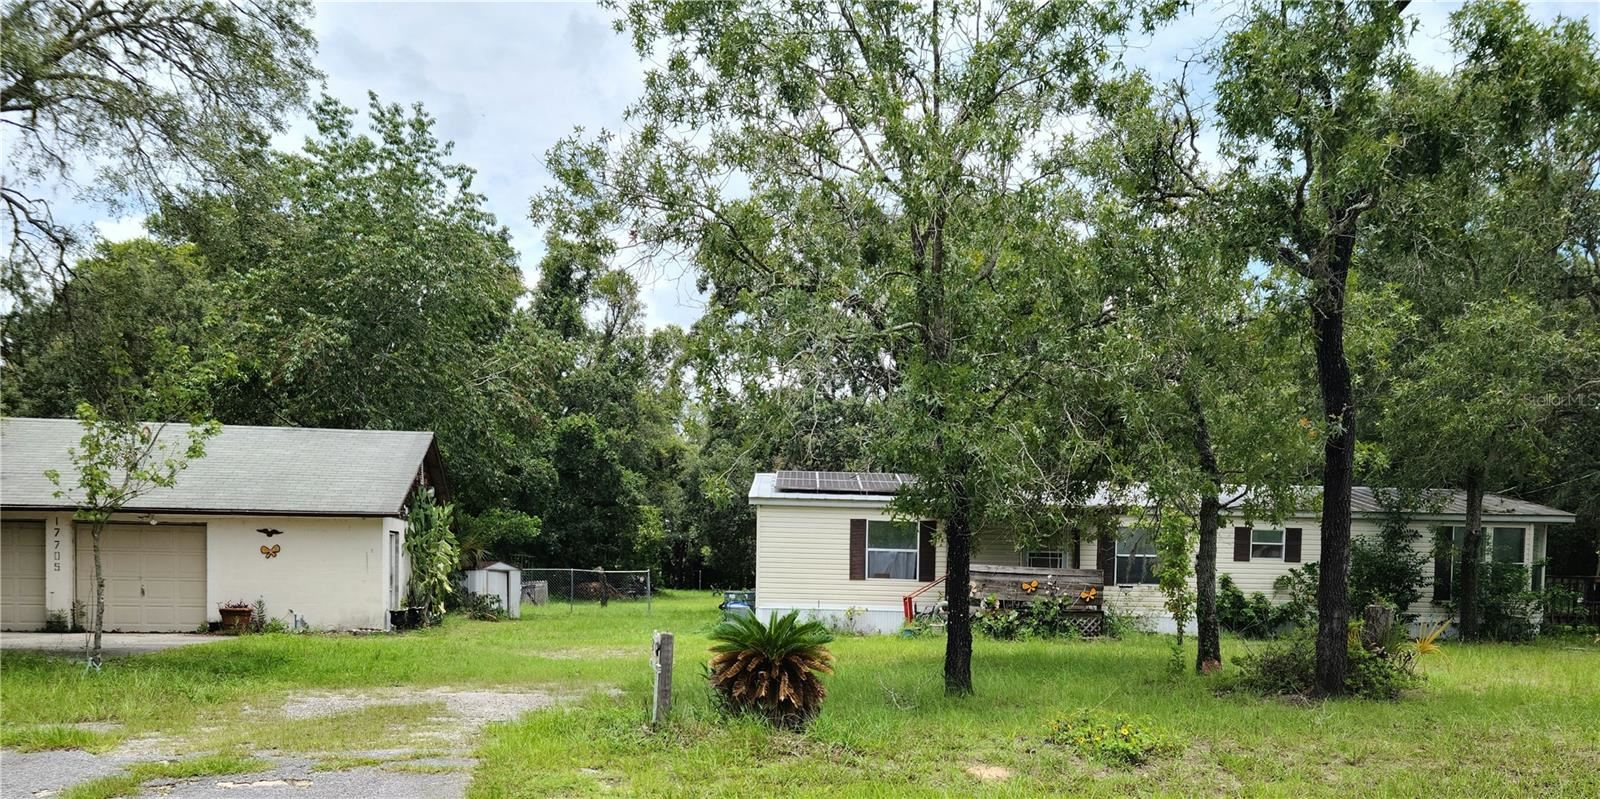 17705 OXENHAM AVENUE, Spring Hill, FL 34610 - MLS#: W7836260